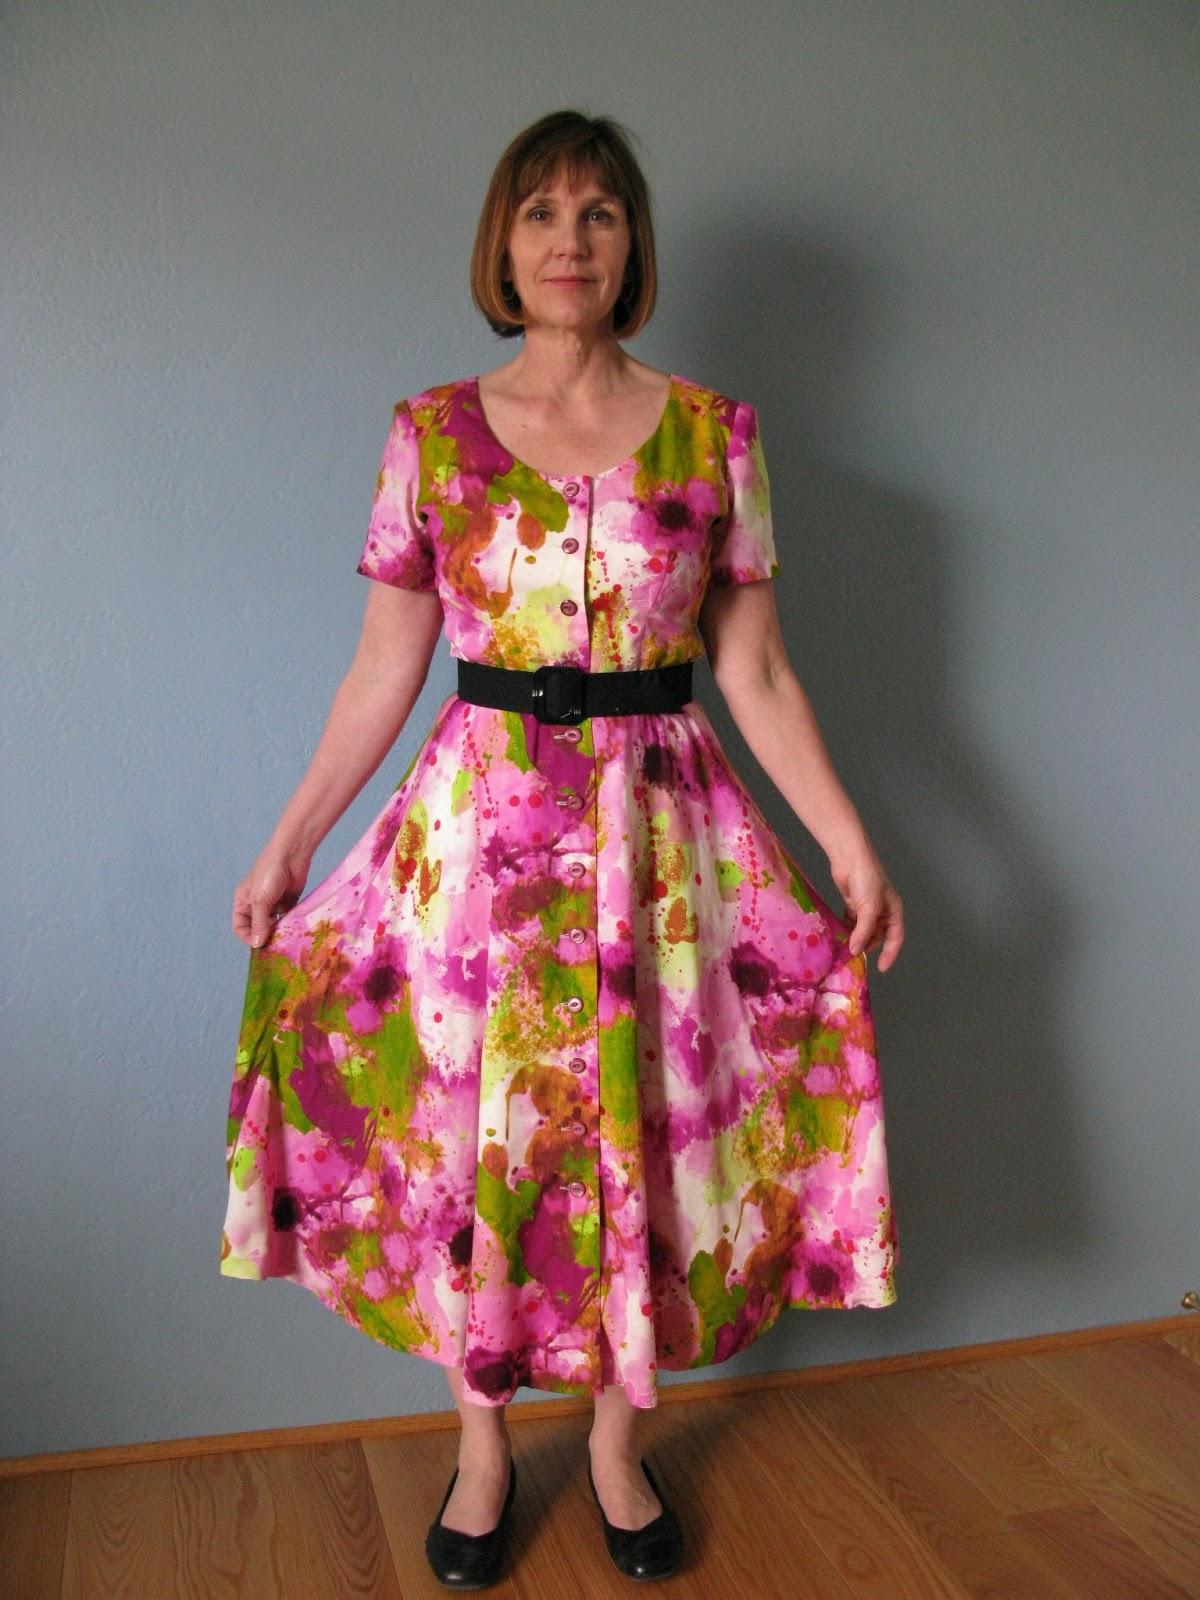 af56f943a60 Retro Sewing Romance Writer  80s Summer Dress!